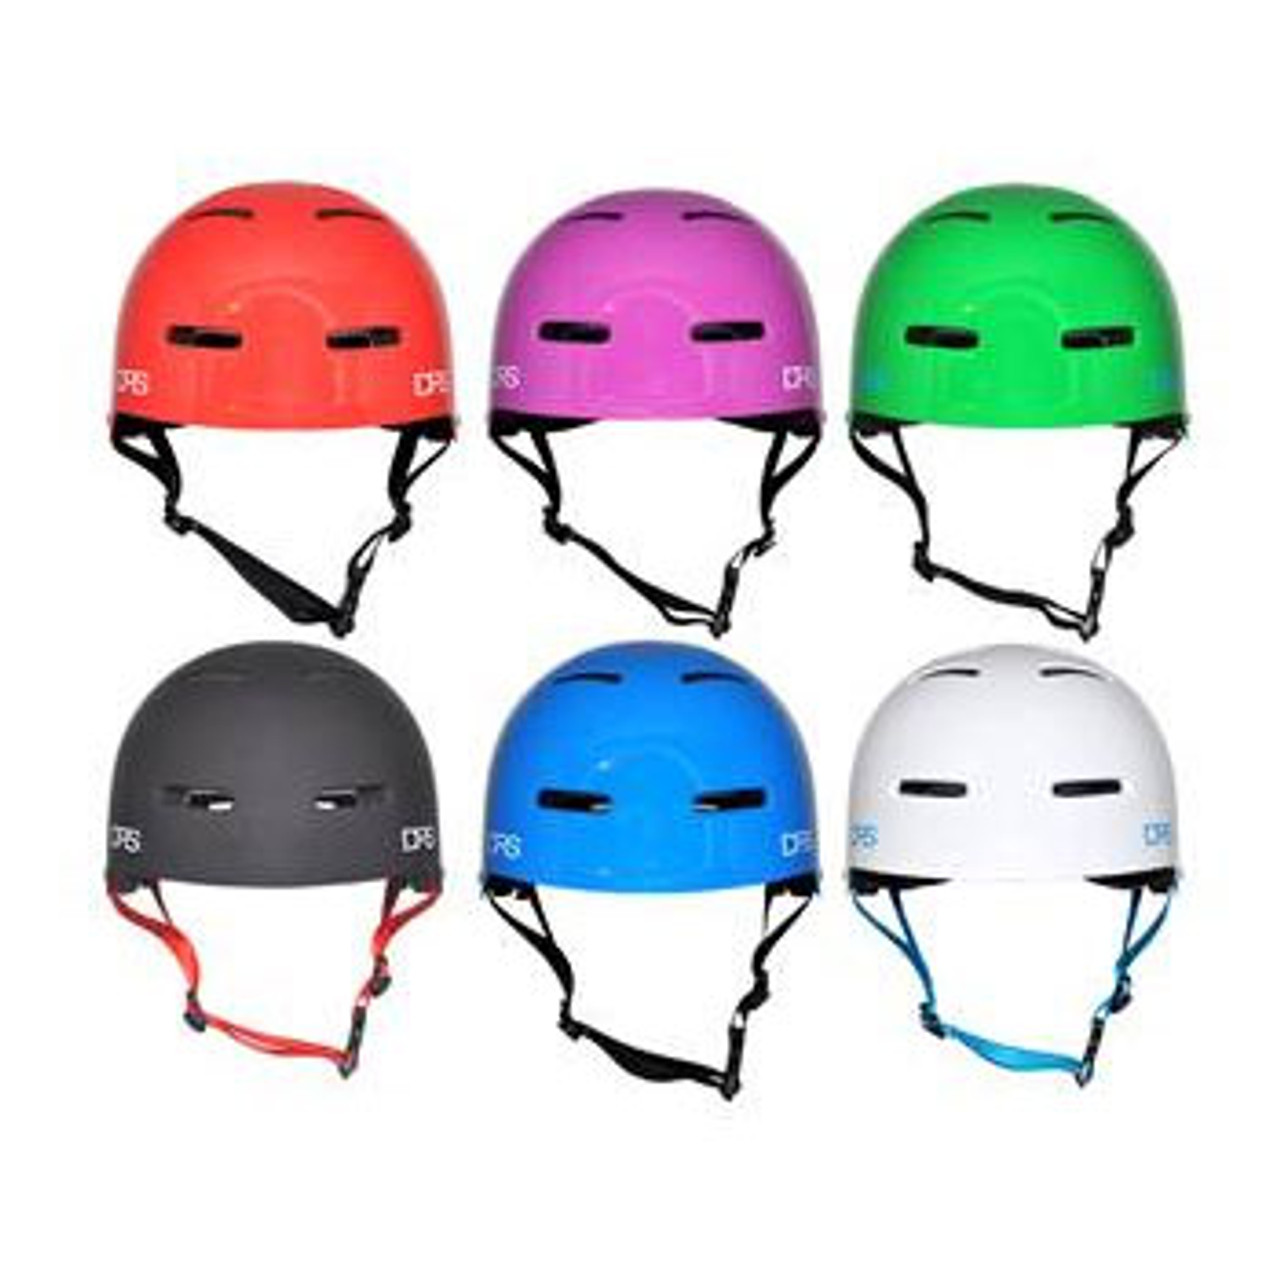 DRS BMX Helmet